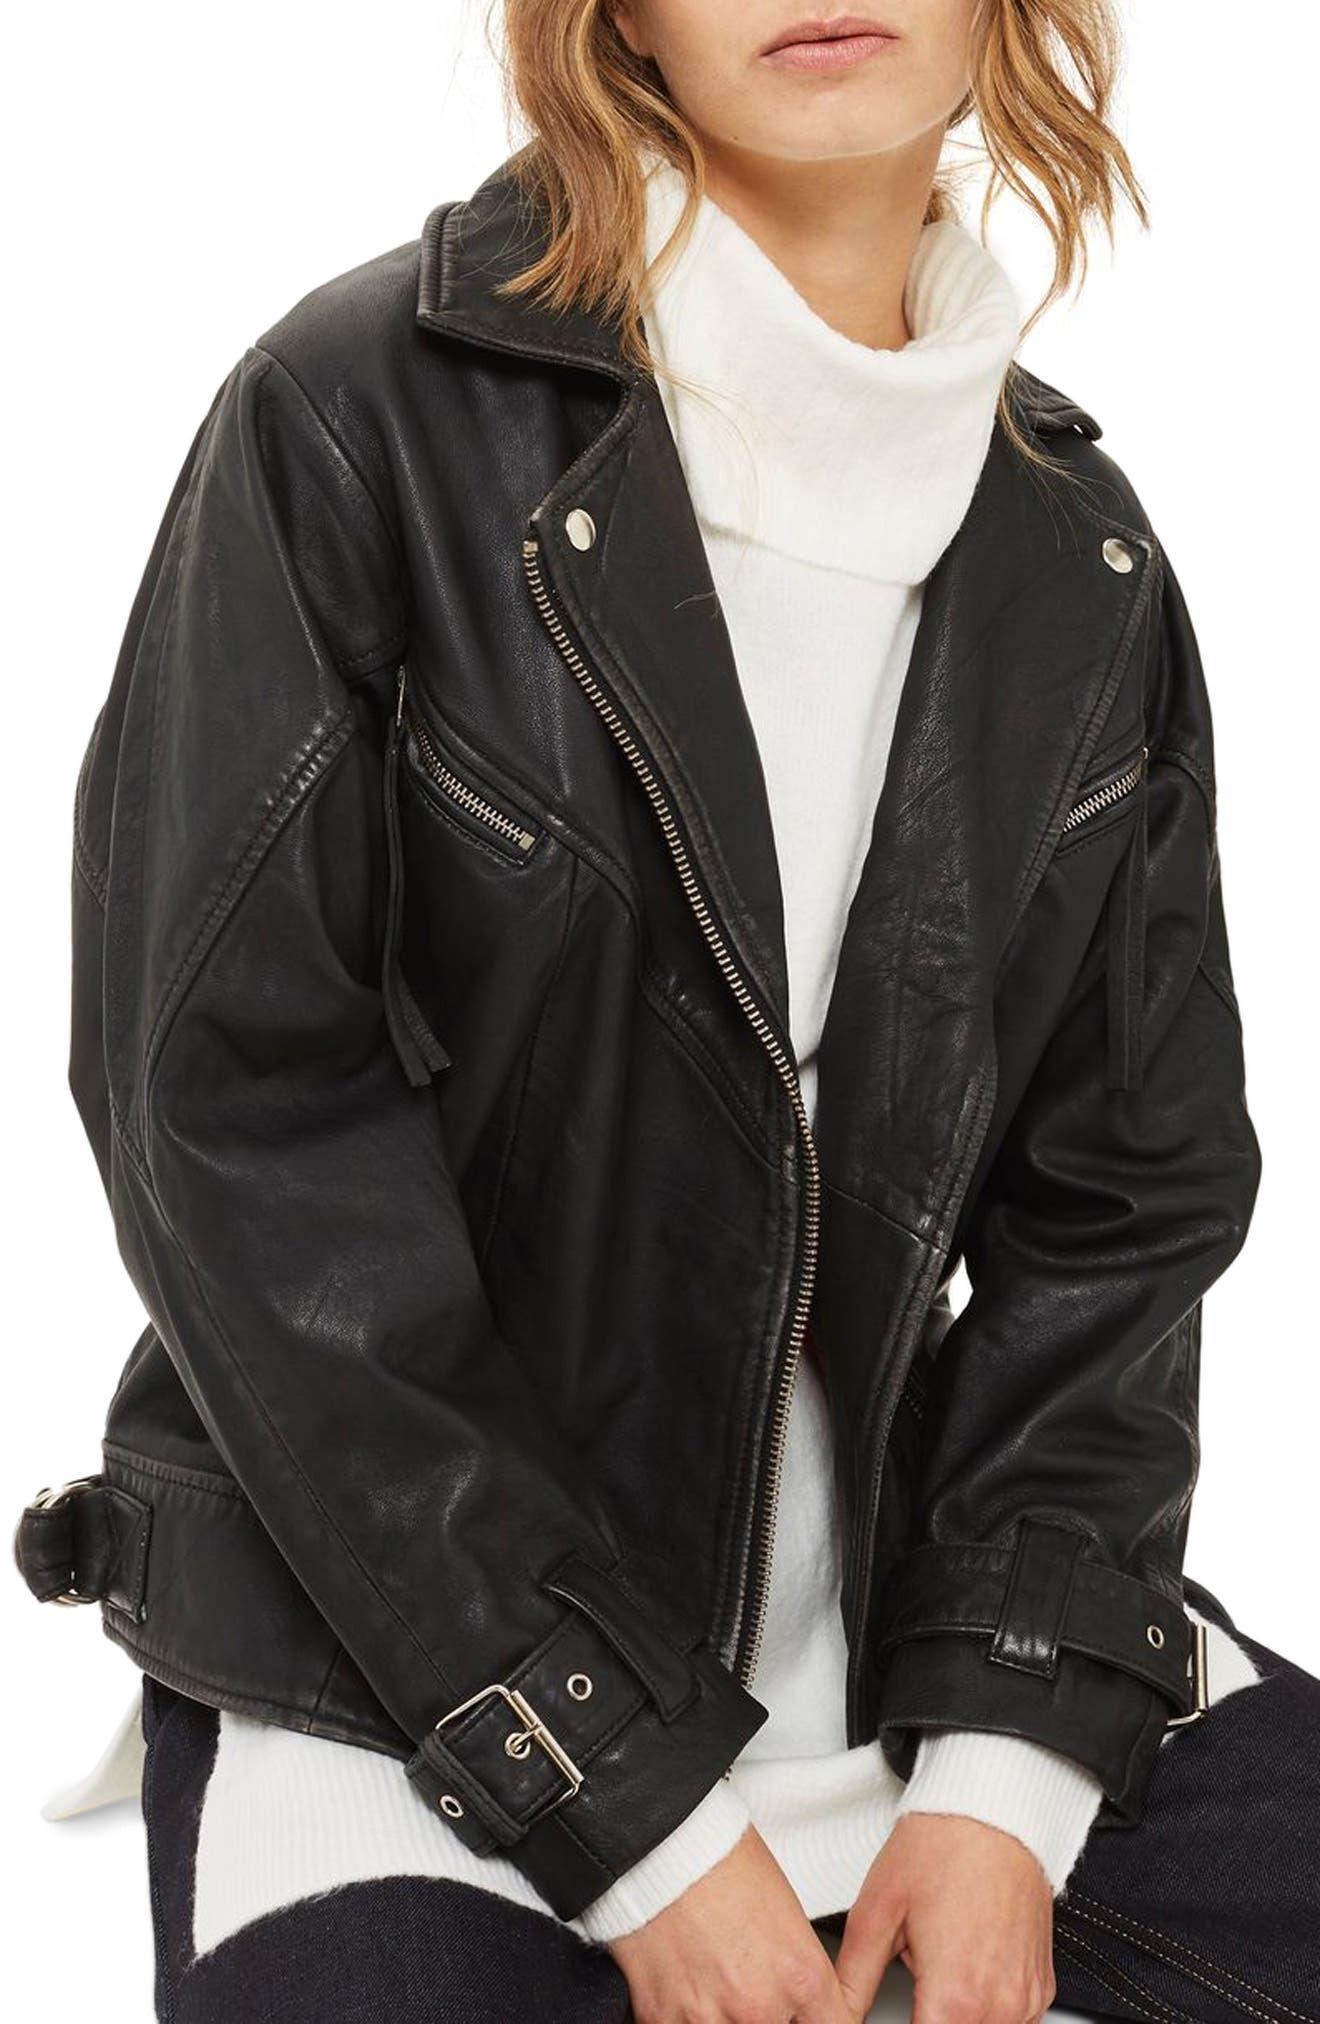 Main Image - Topshop Teddy Oversize Leather Biker Jacket